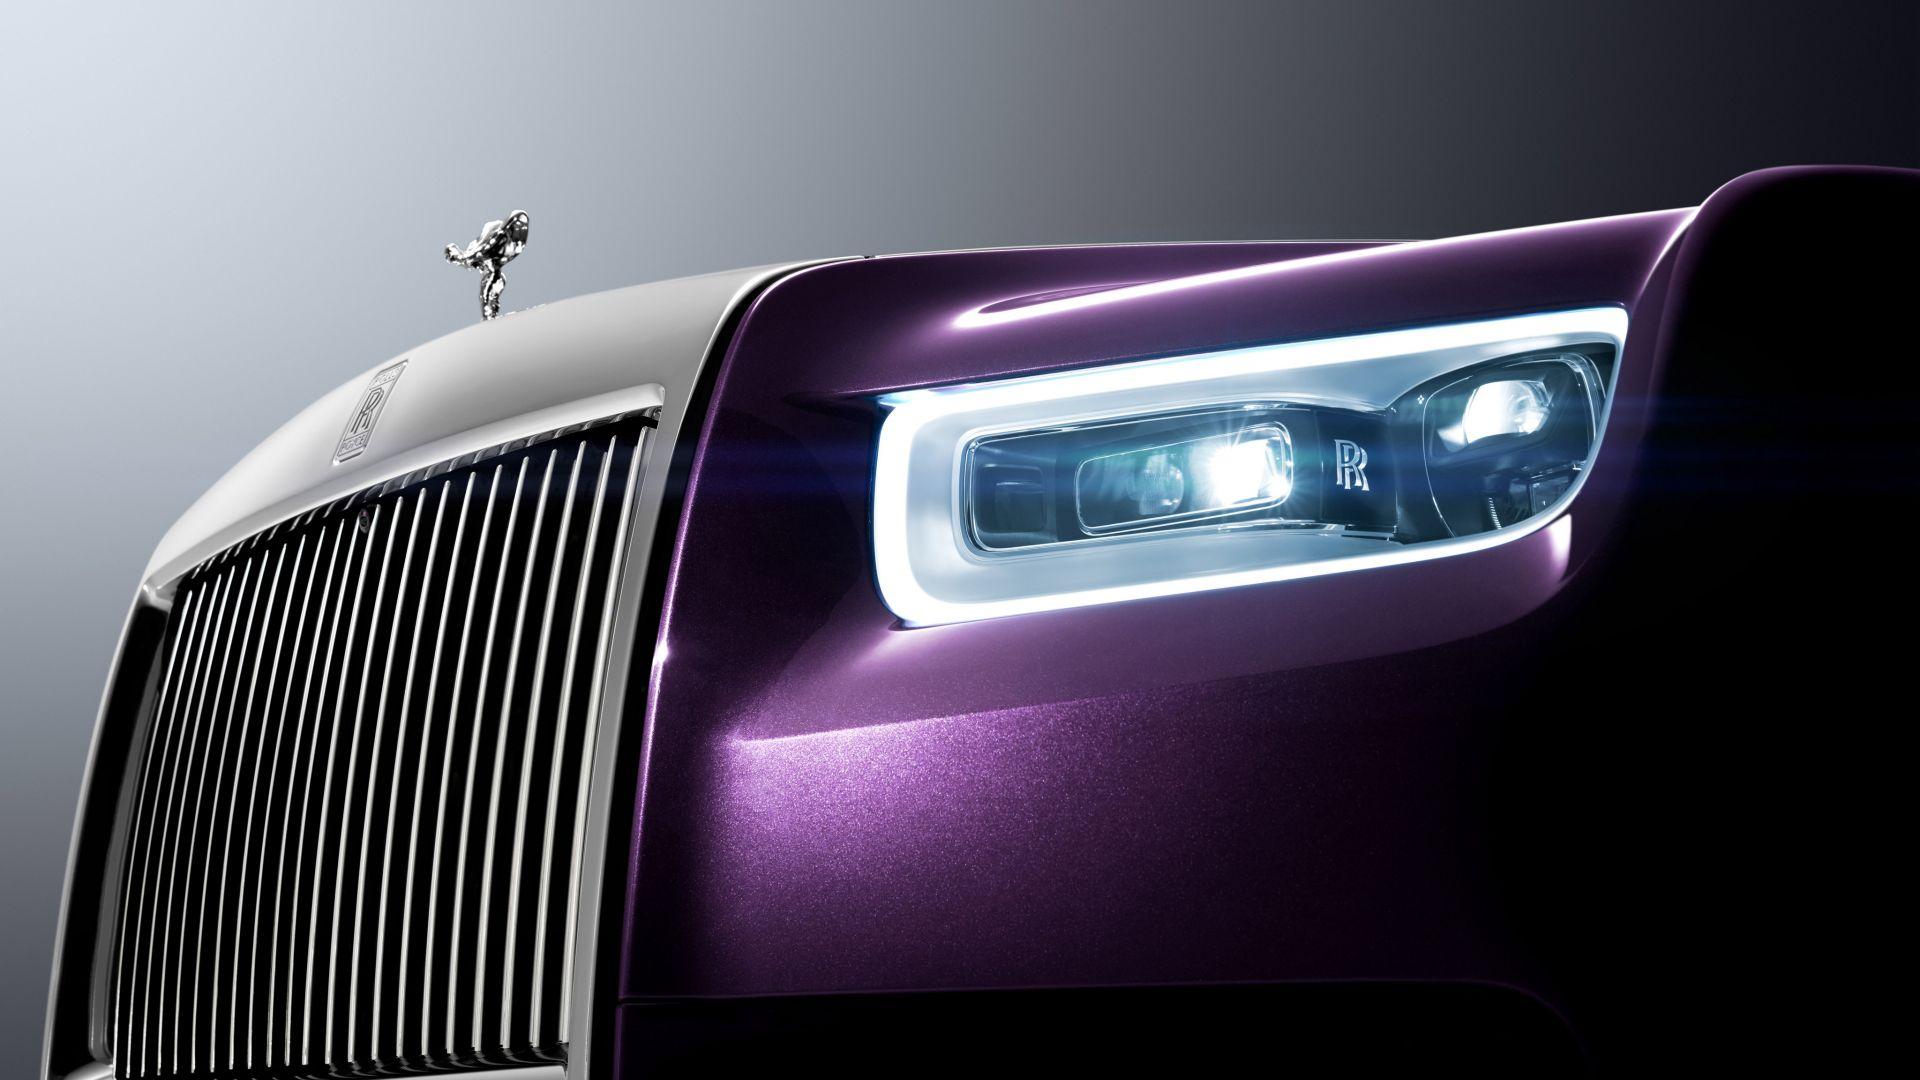 Desktop Wallpaper Rolls Royce Phantom Logo Headlights Hd Image